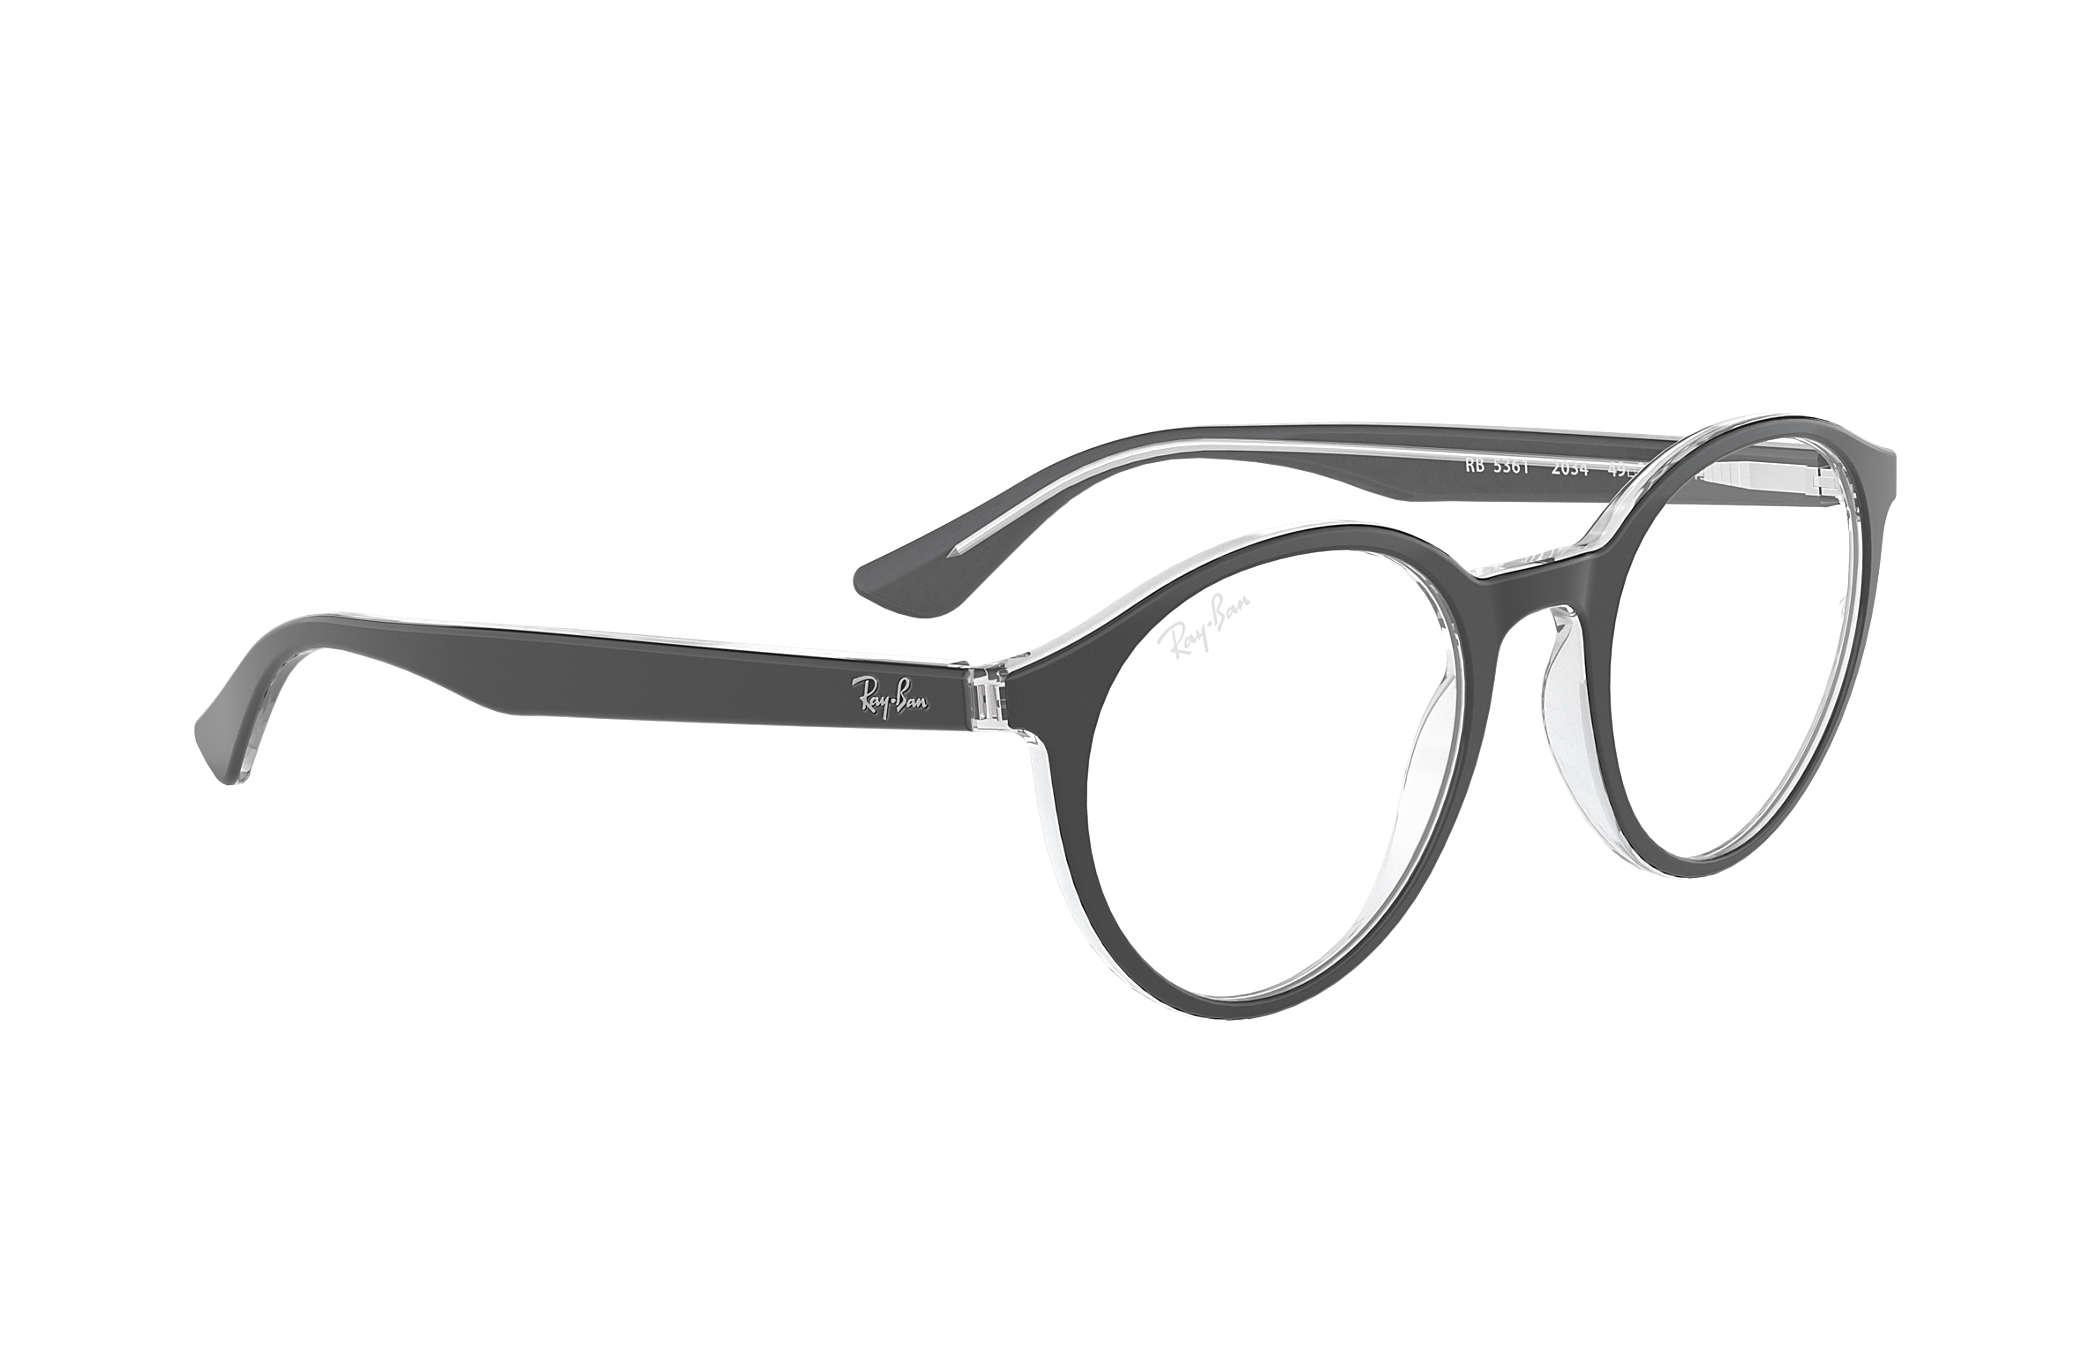 eb71c2eced Ray-Ban prescription glasses RB5361 Black - Acetate - 0RX5361203451 ...